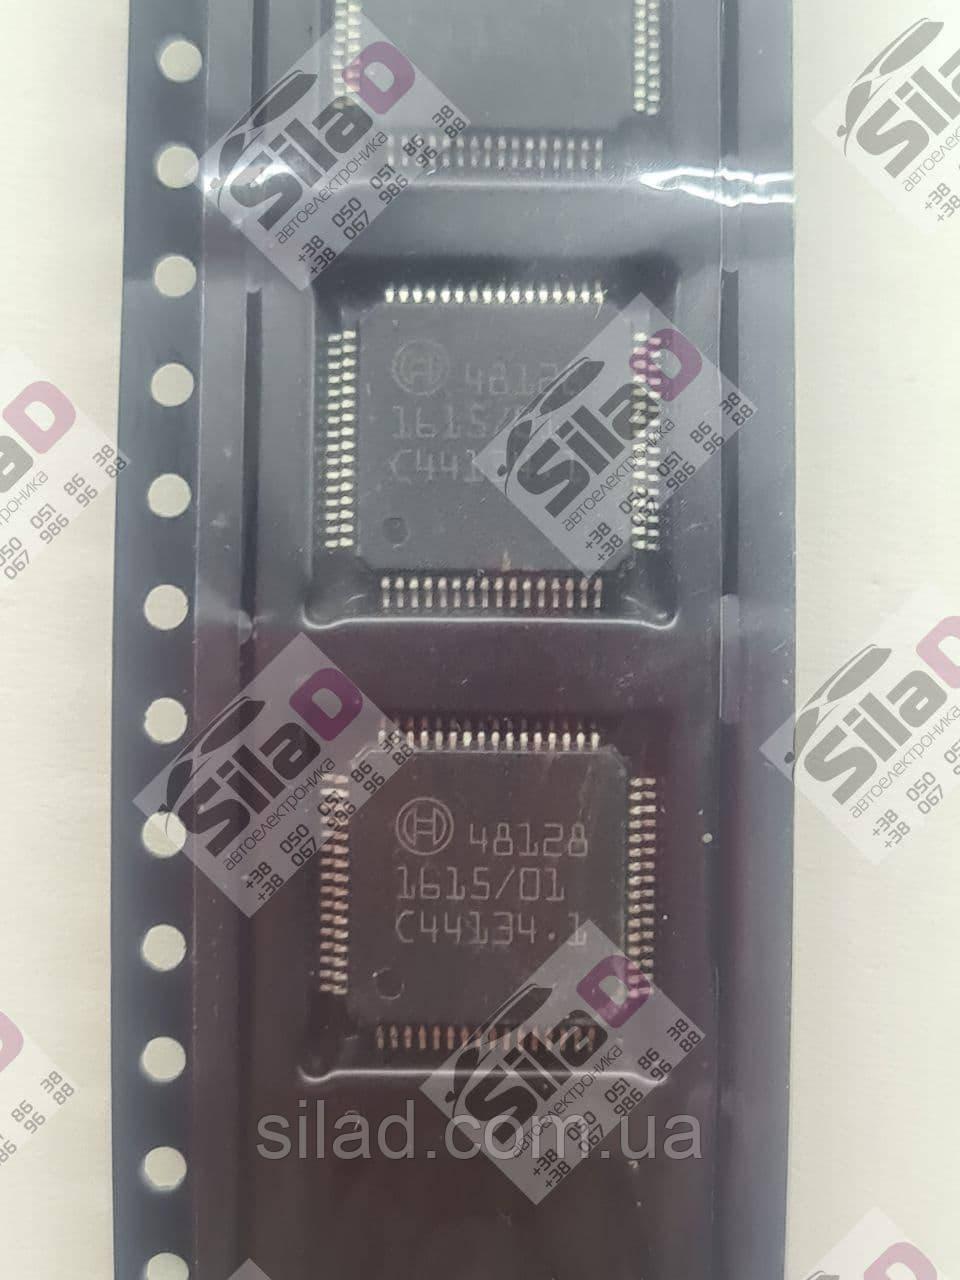 Мікросхема Bosch 48128 корпус QFP64